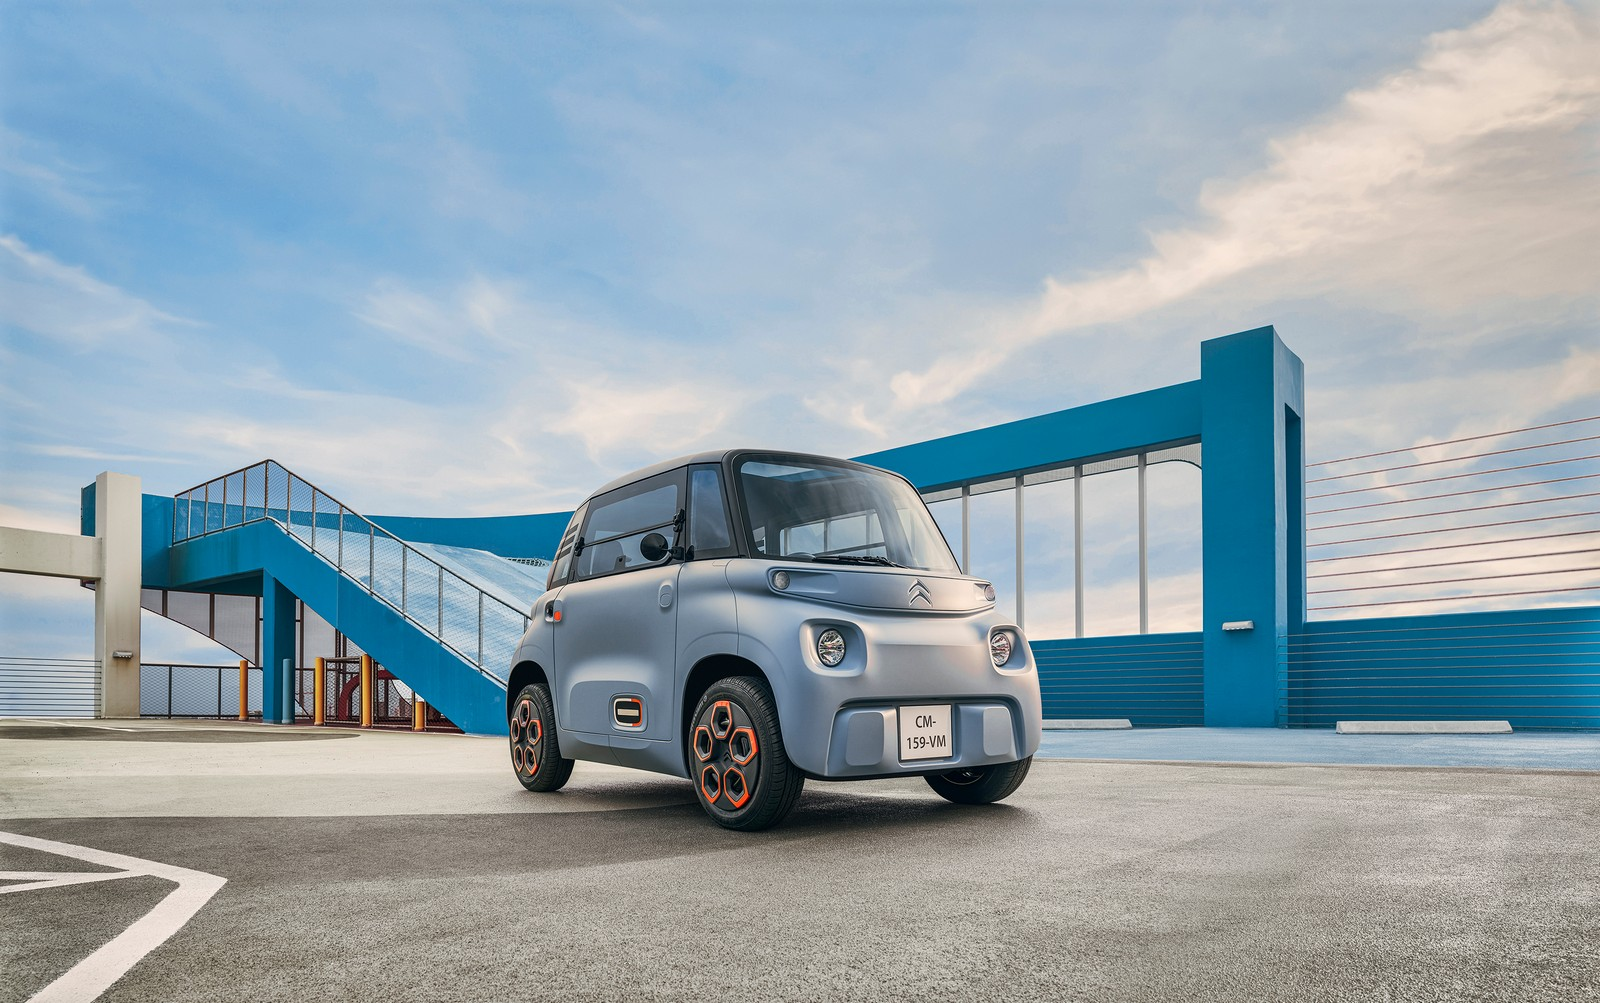 Citroën AMI coche eléctrico sin carnet